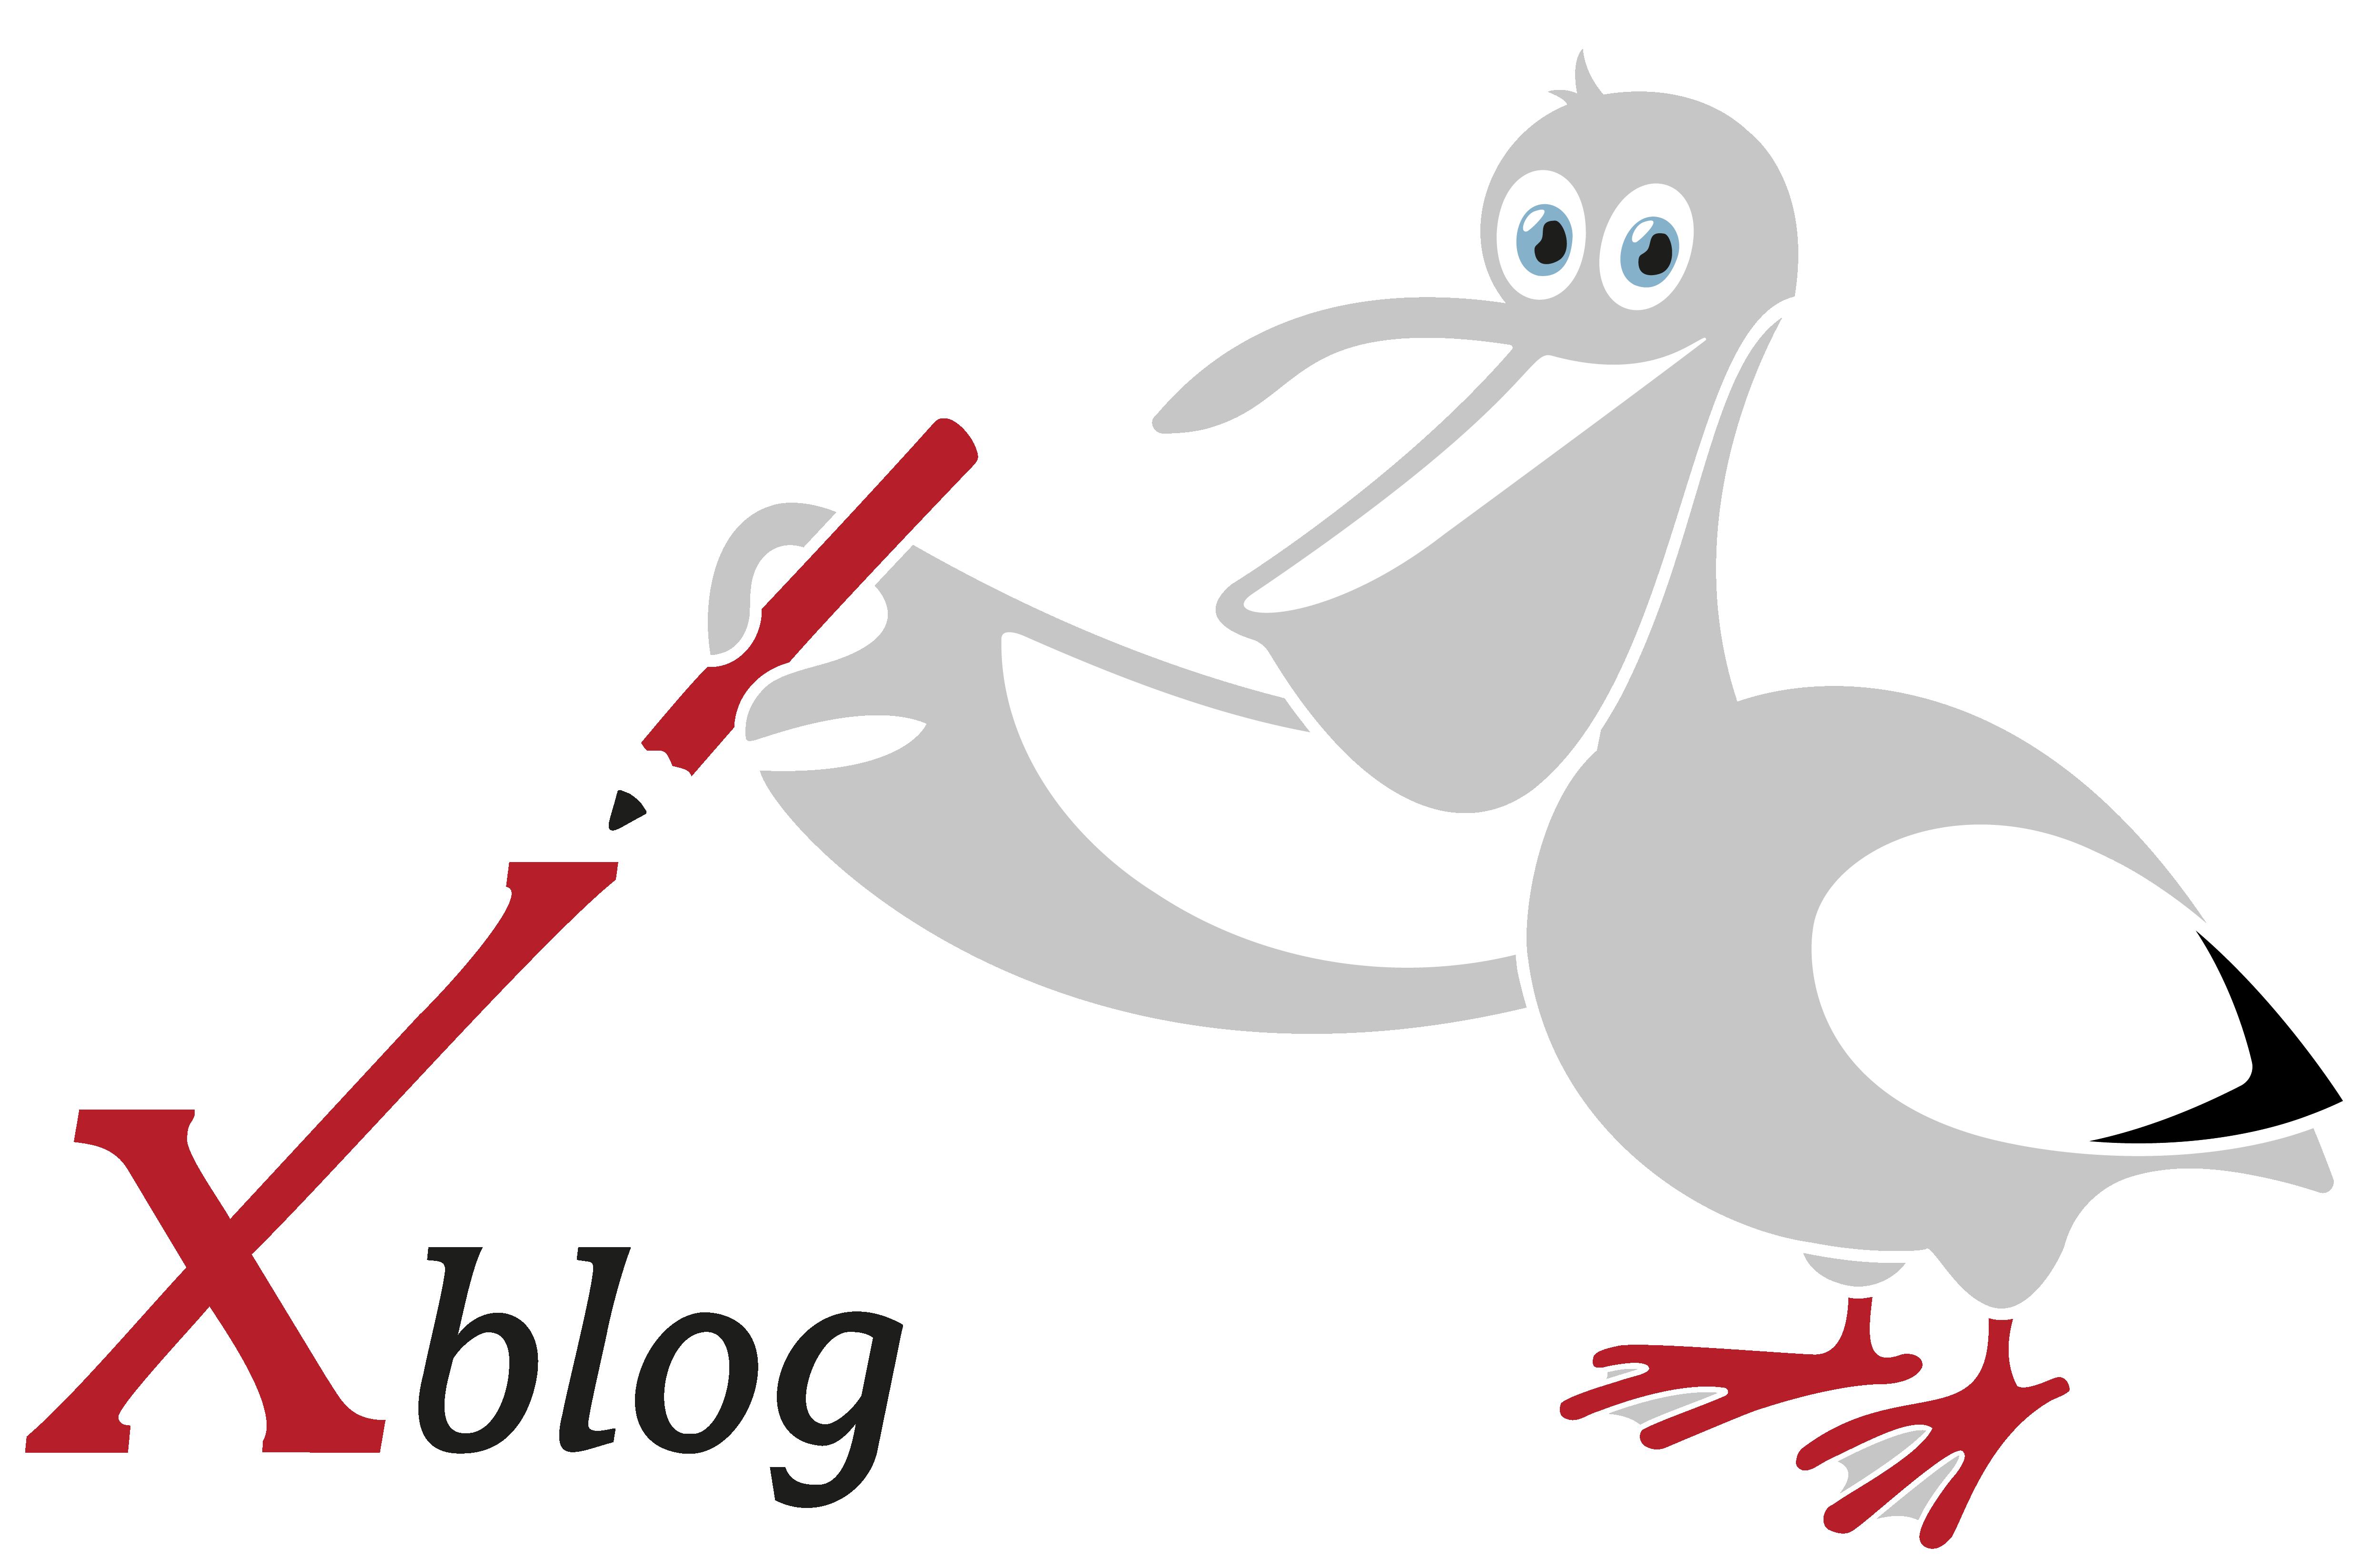 Xblog Logo